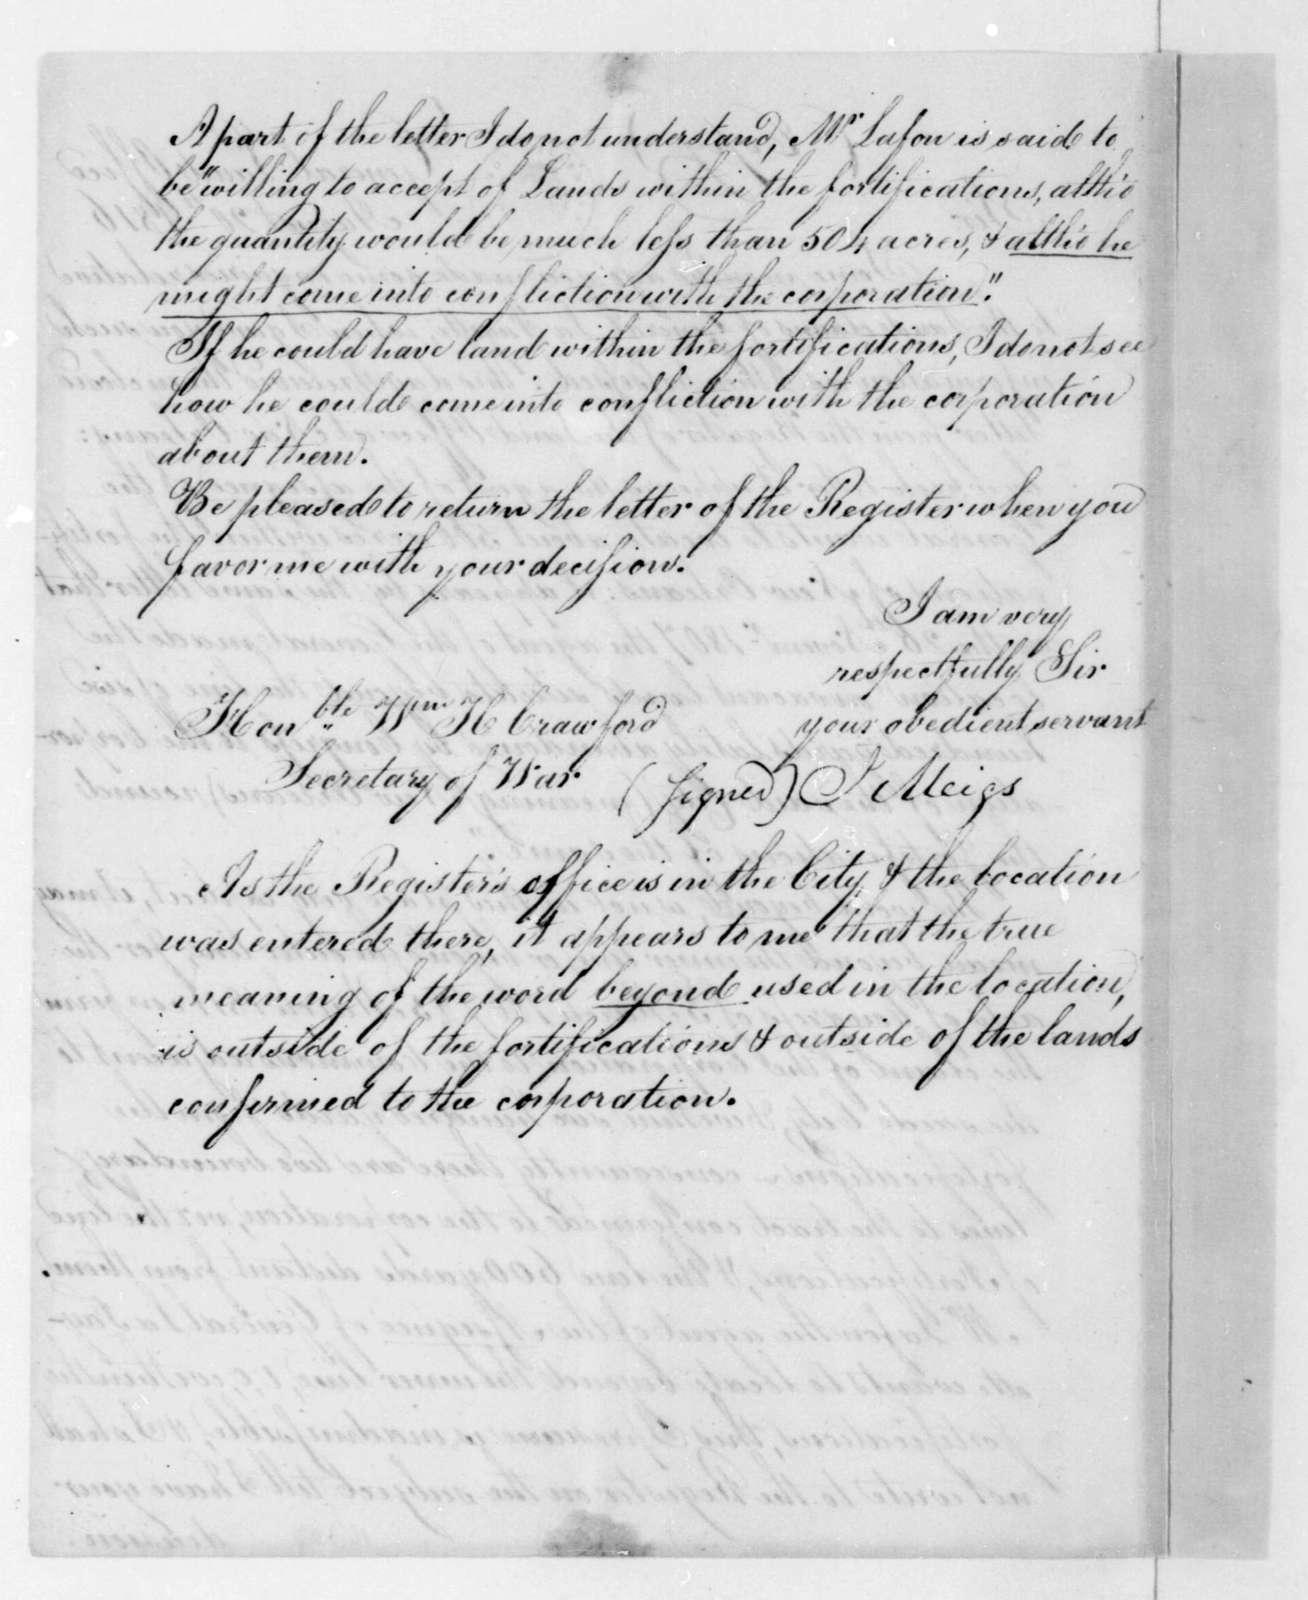 Josiah Meigs to William H. Crawford, August 20, 1816.